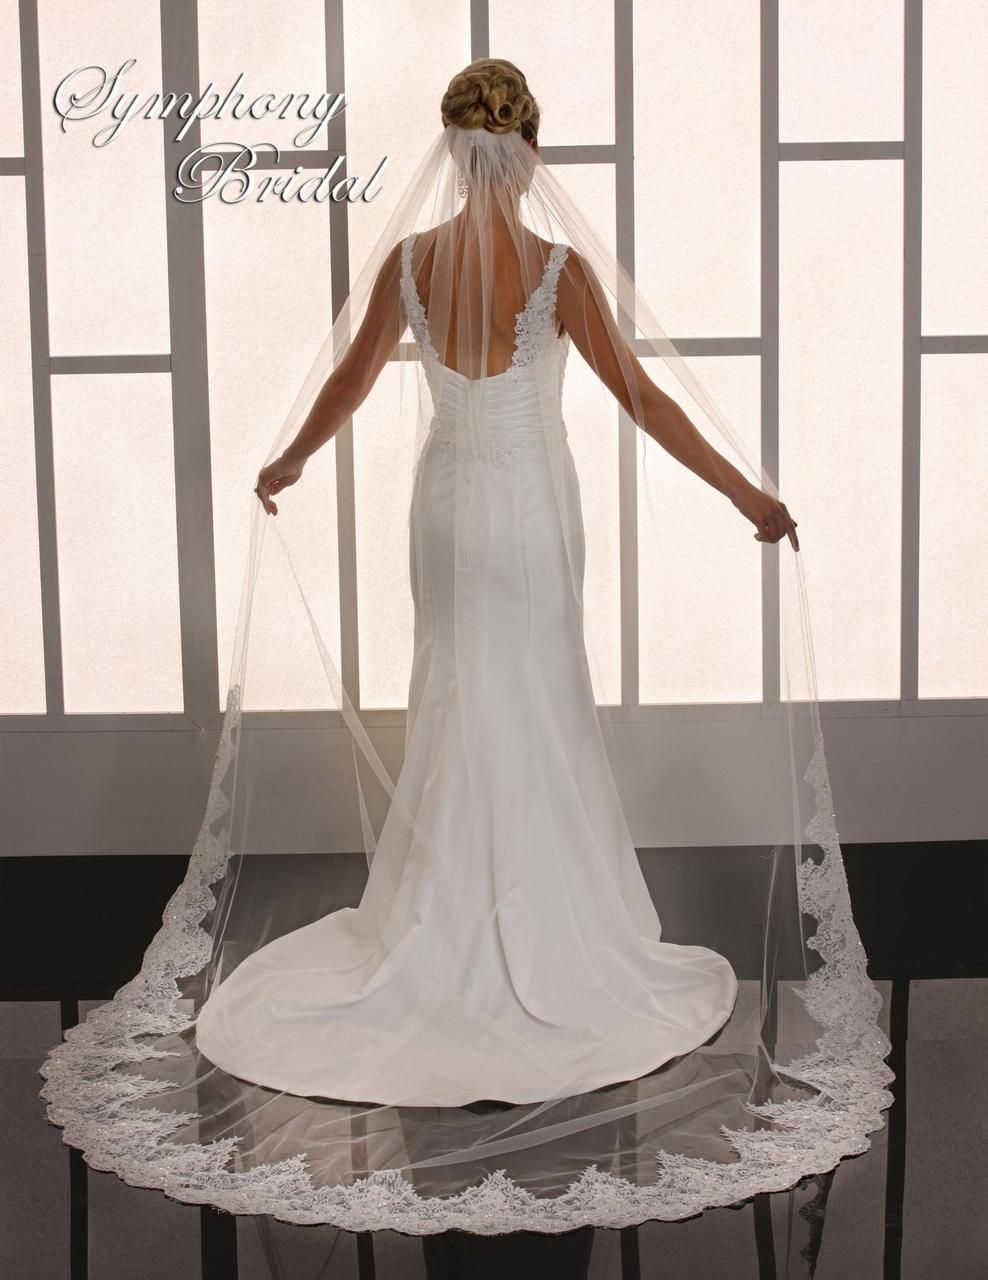 Fabulous Lace Cathedral Wedding Veil Symphony Bridal 6773VL - Affordable Elegance Bridal -